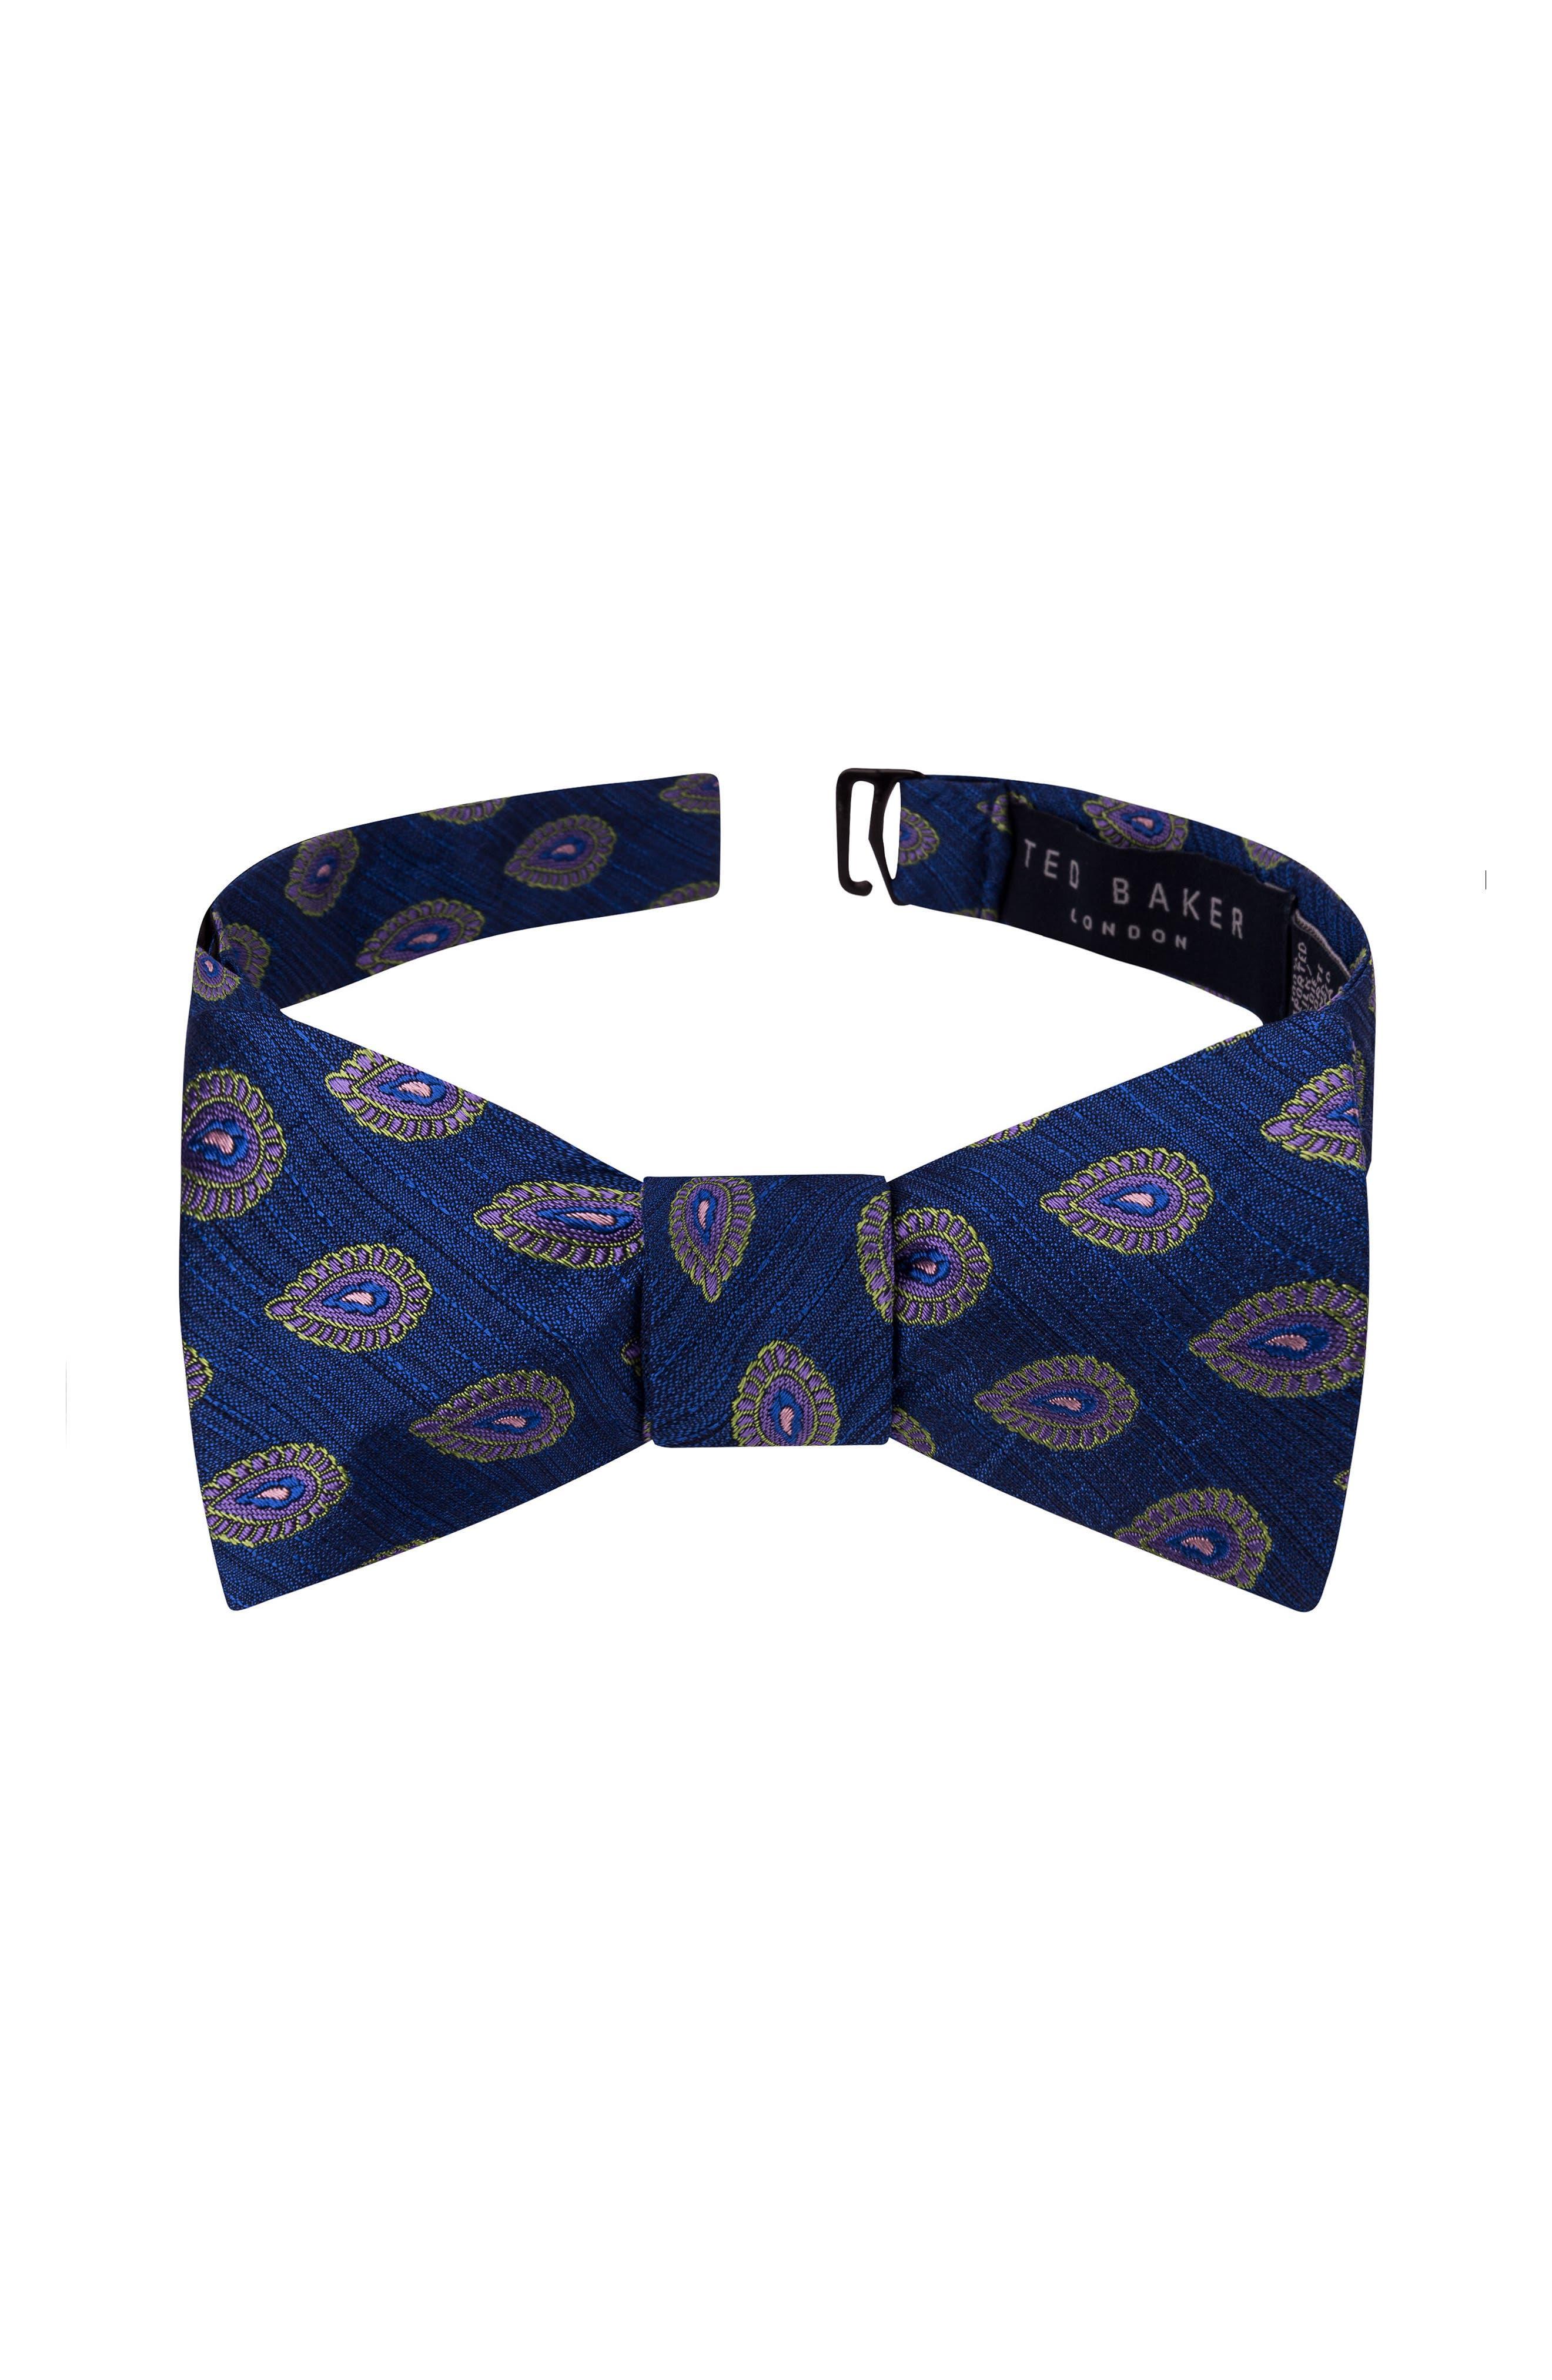 Main Image - Ted Baker London Elegant Medallion Silk Bow Tie